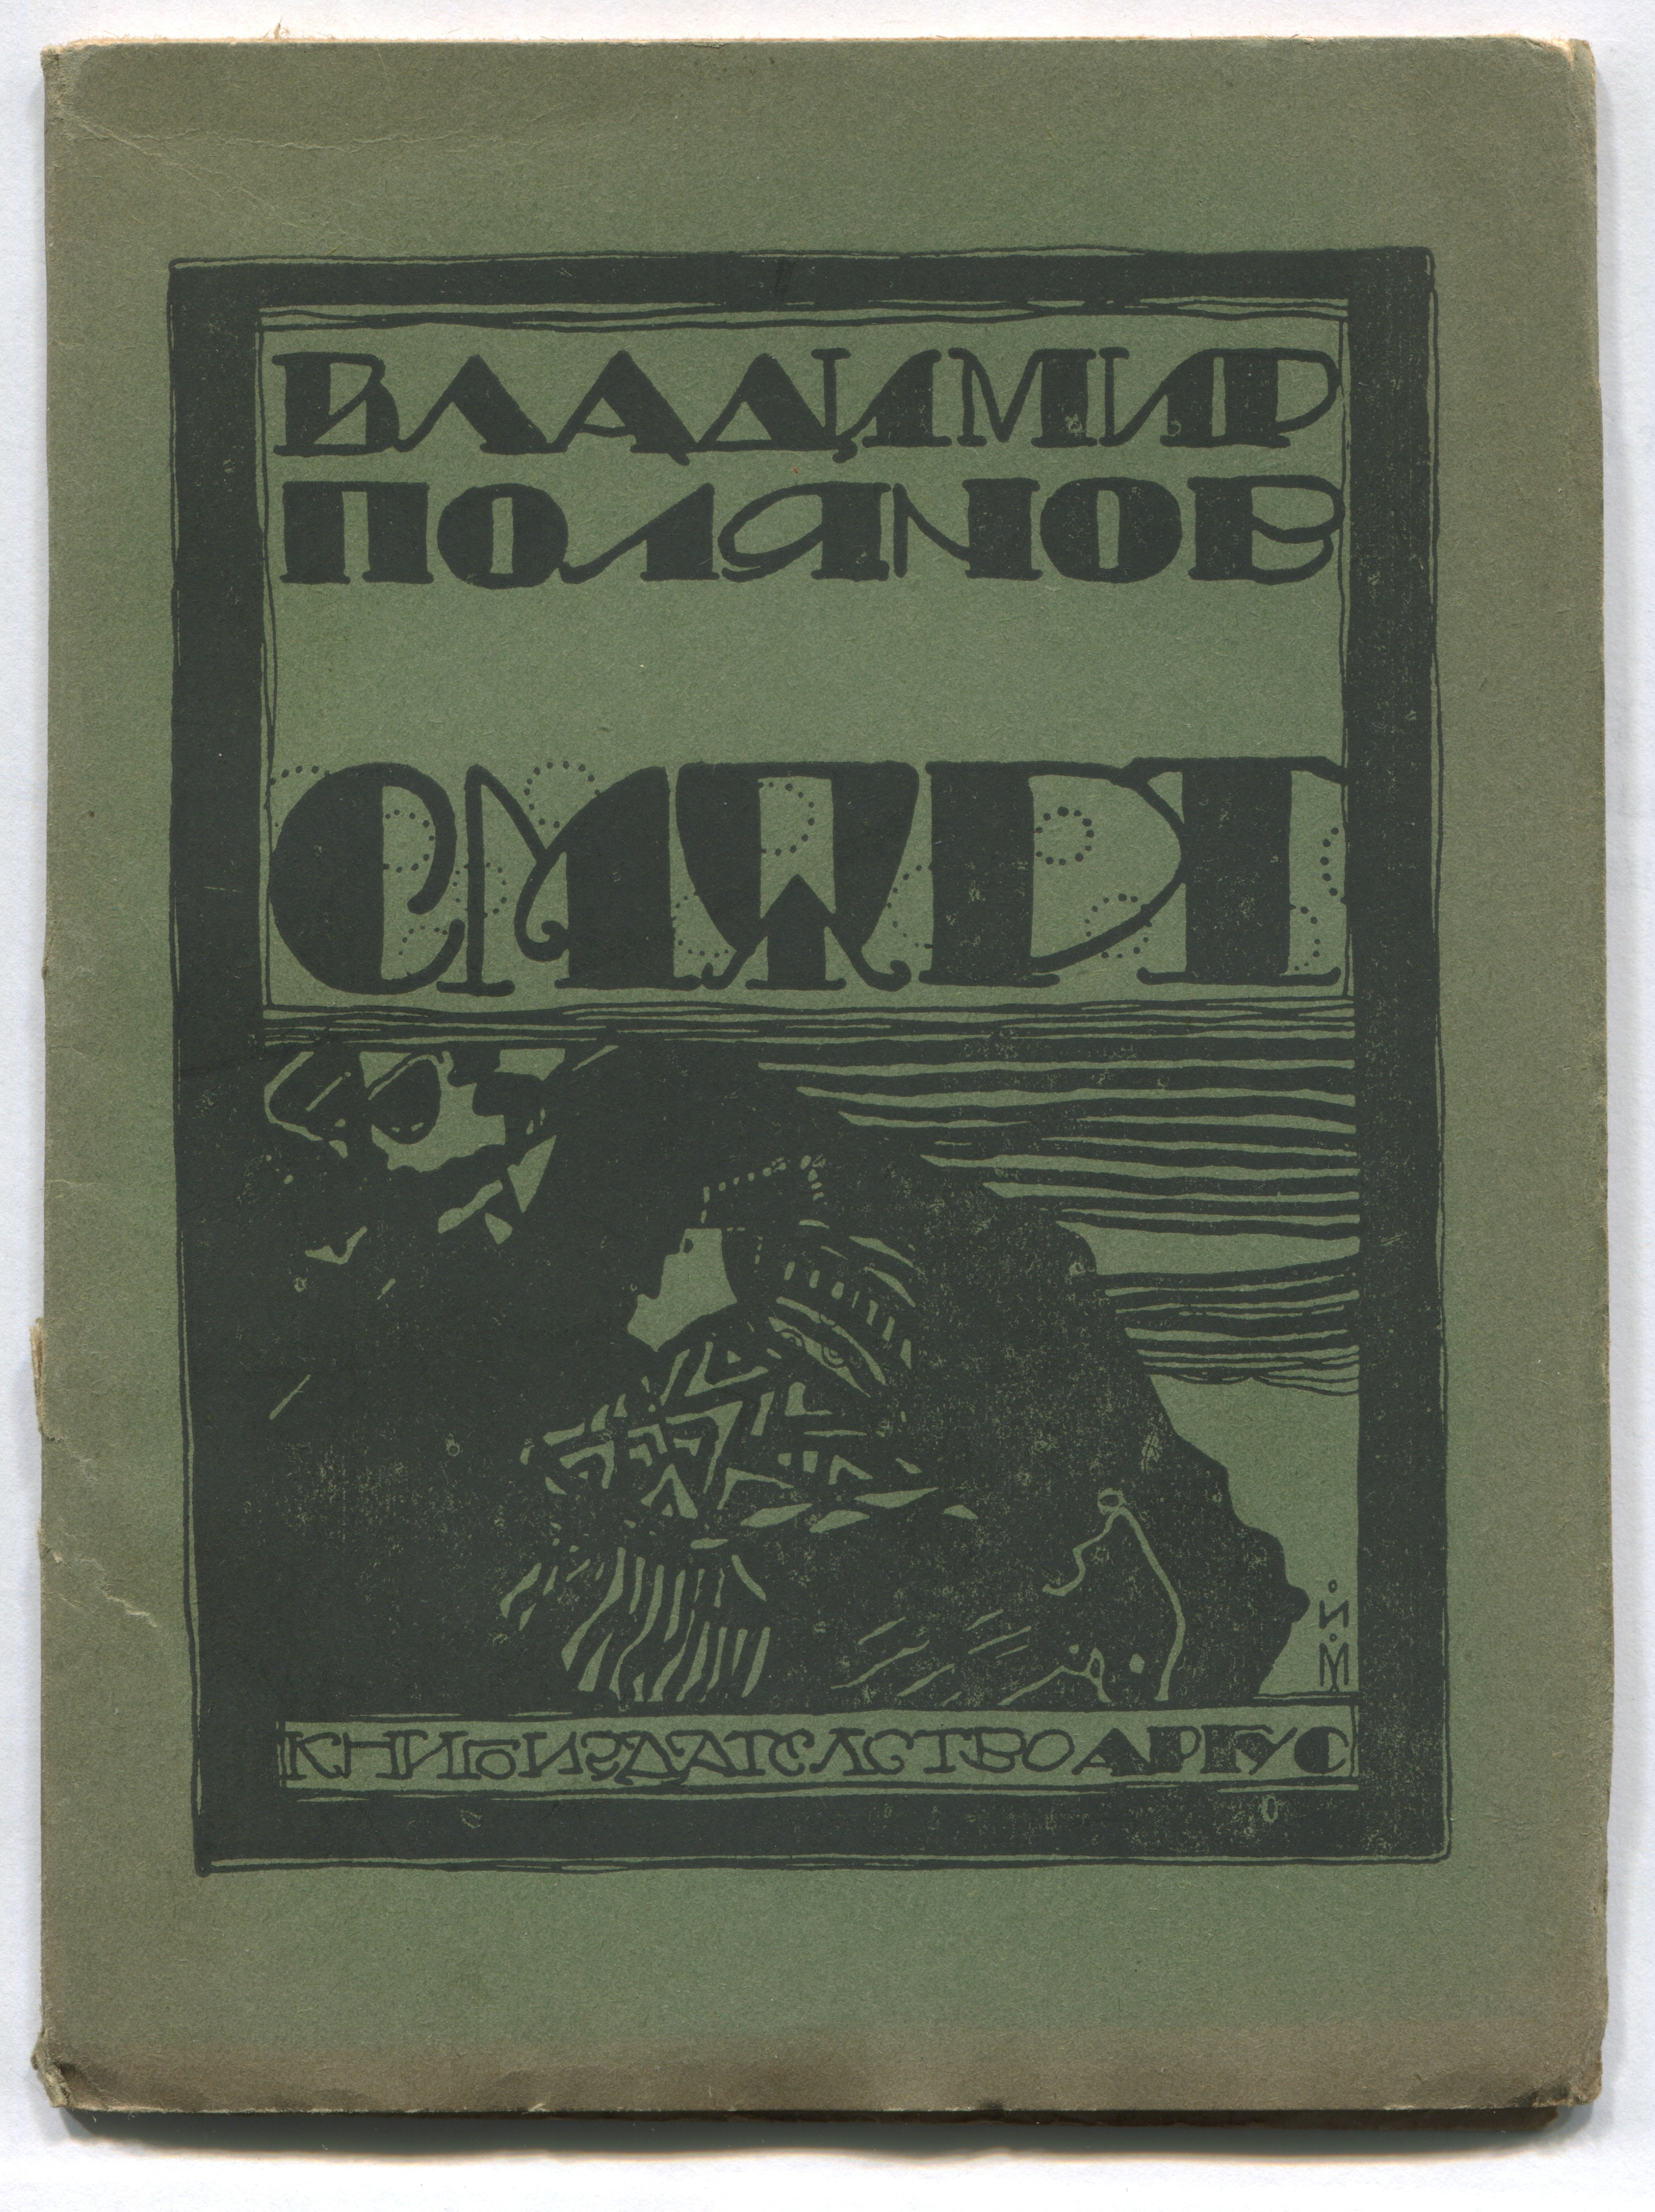 Художник на корицата: Иван Милев